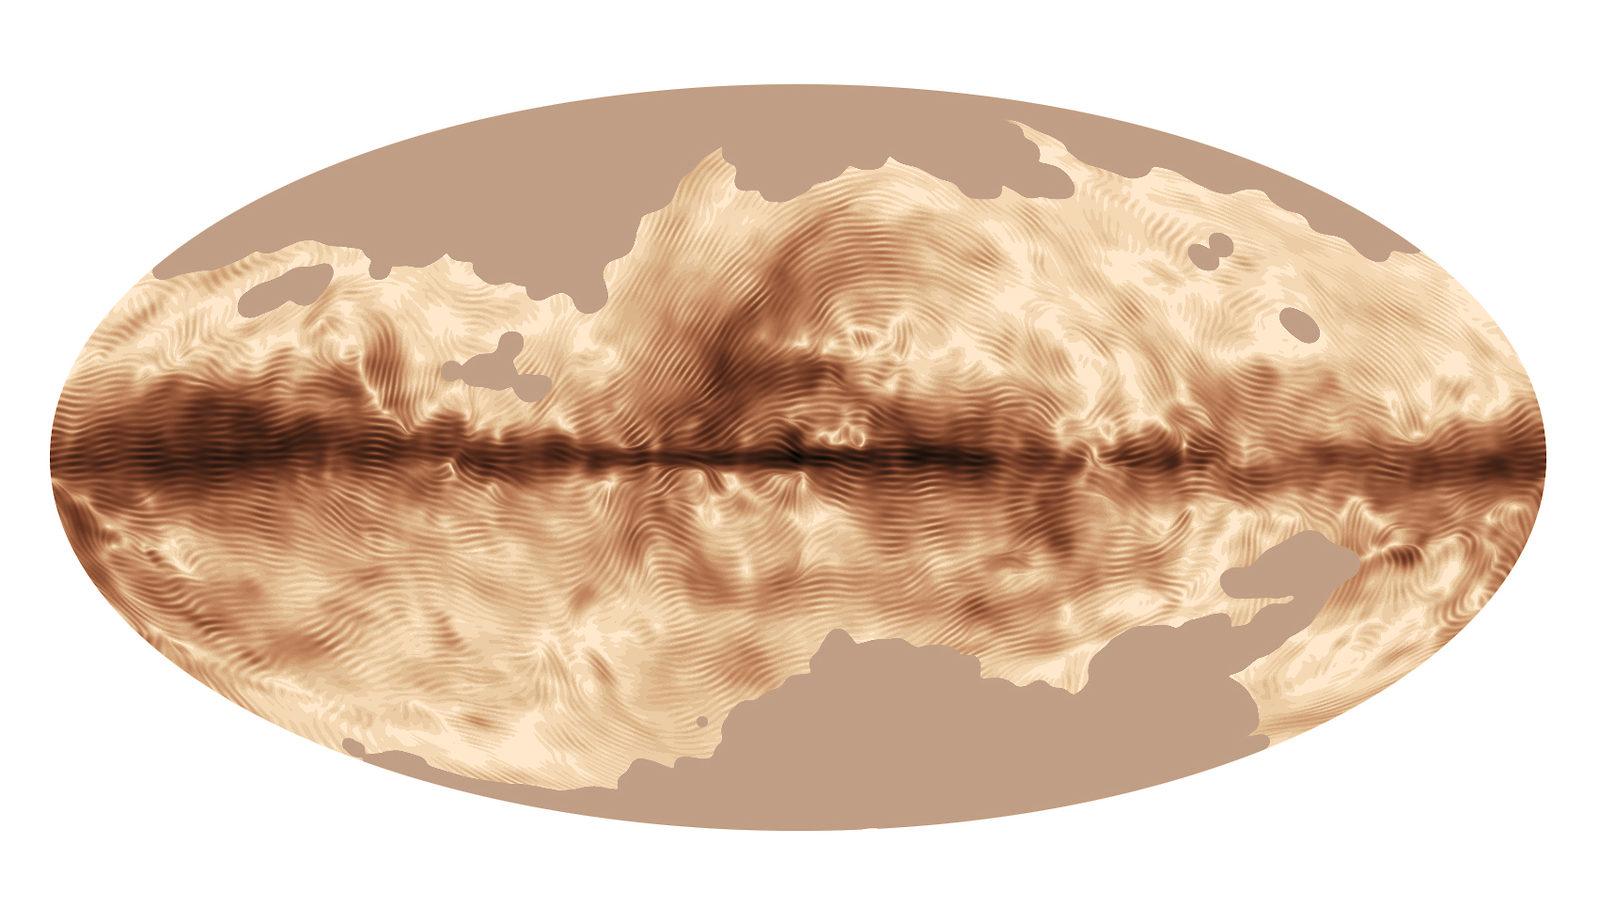 Illustration of Milky Way fingerprint